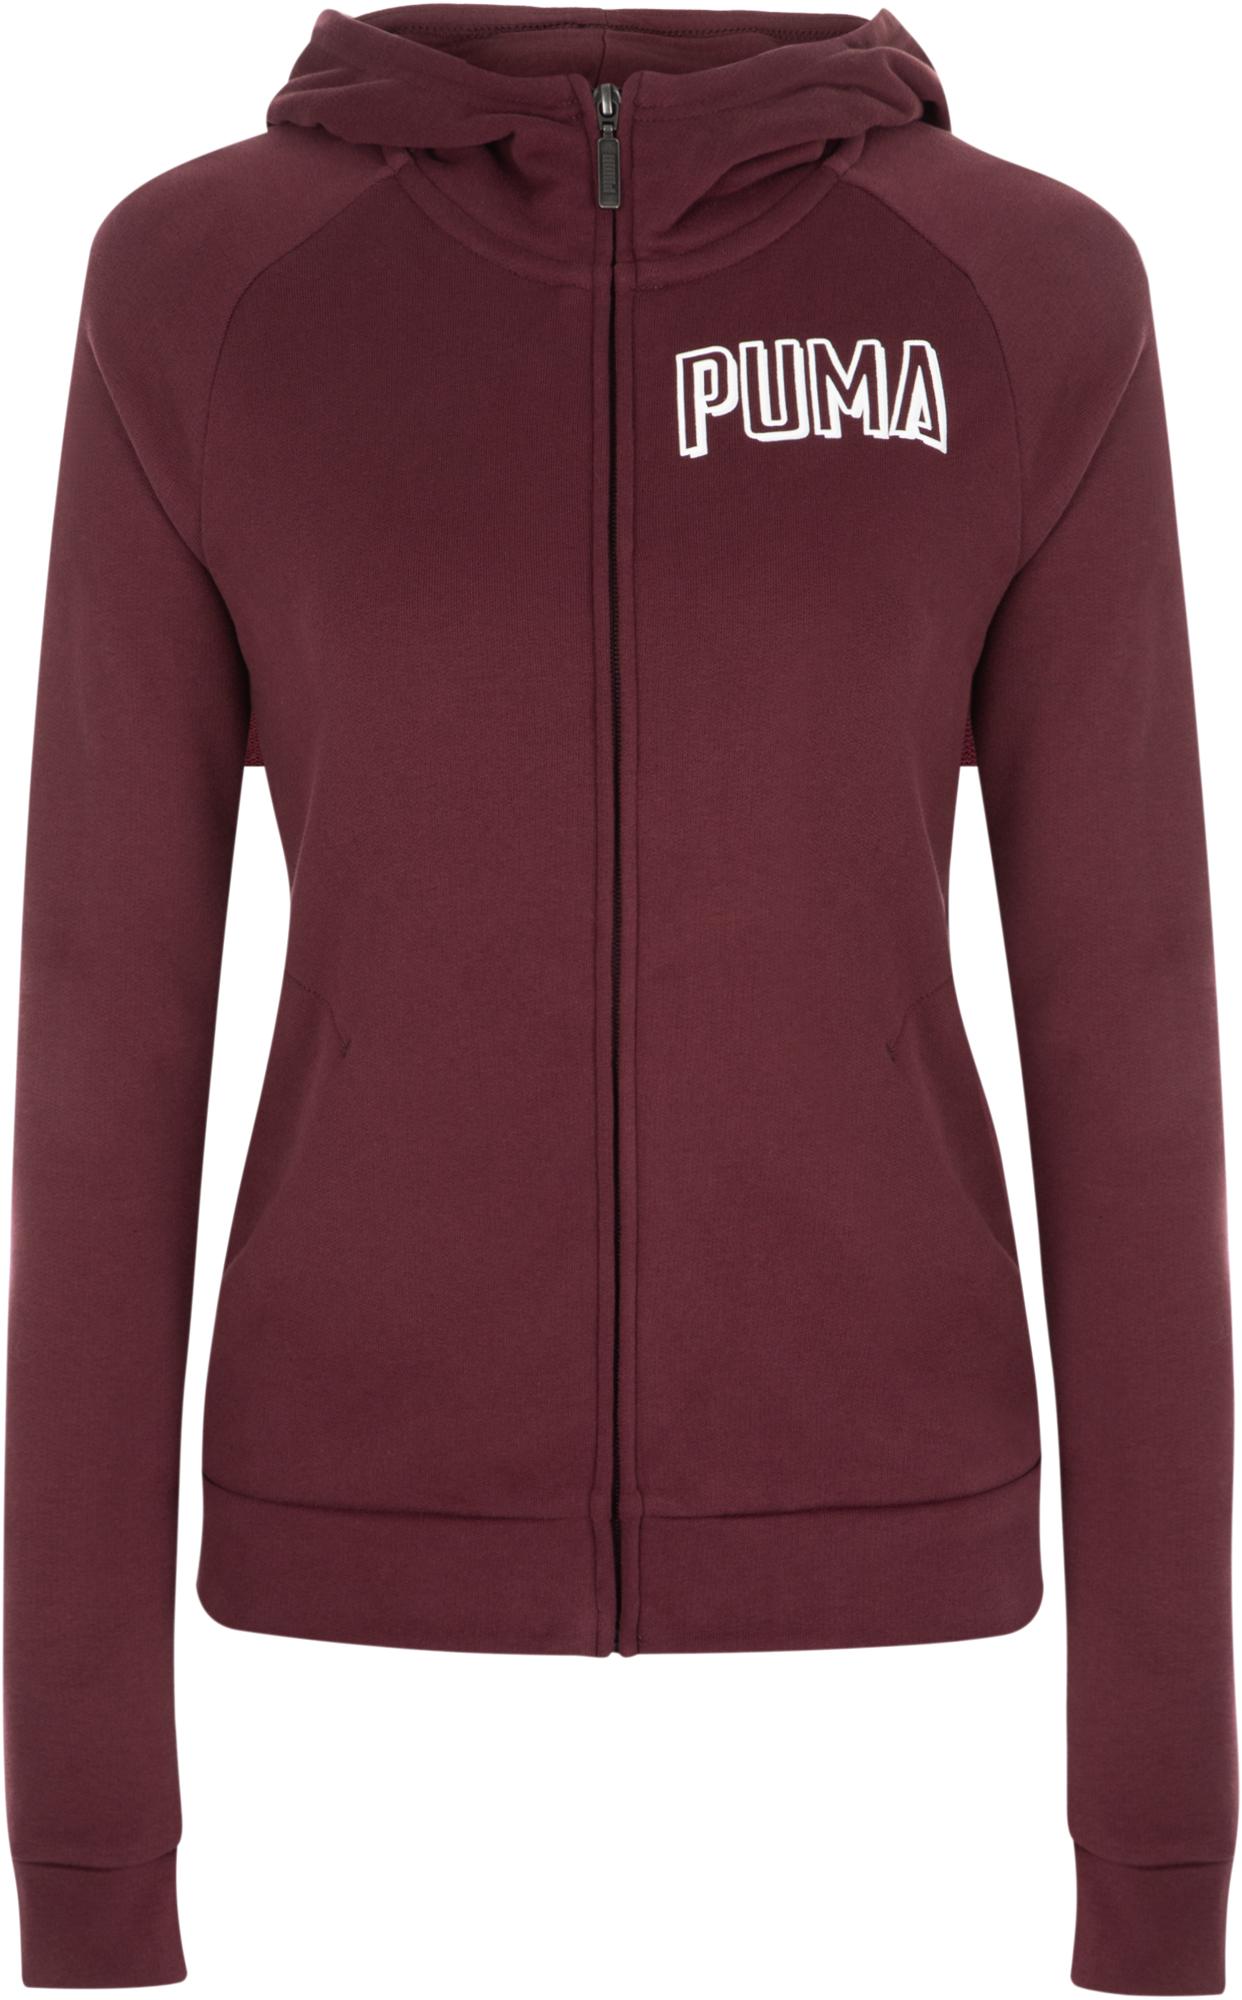 Puma Джемпер женский Puma Athletics, размер 48-50 лонгслив женский puma run hooded top w цвет светло серый 51628202 размер xl 48 50